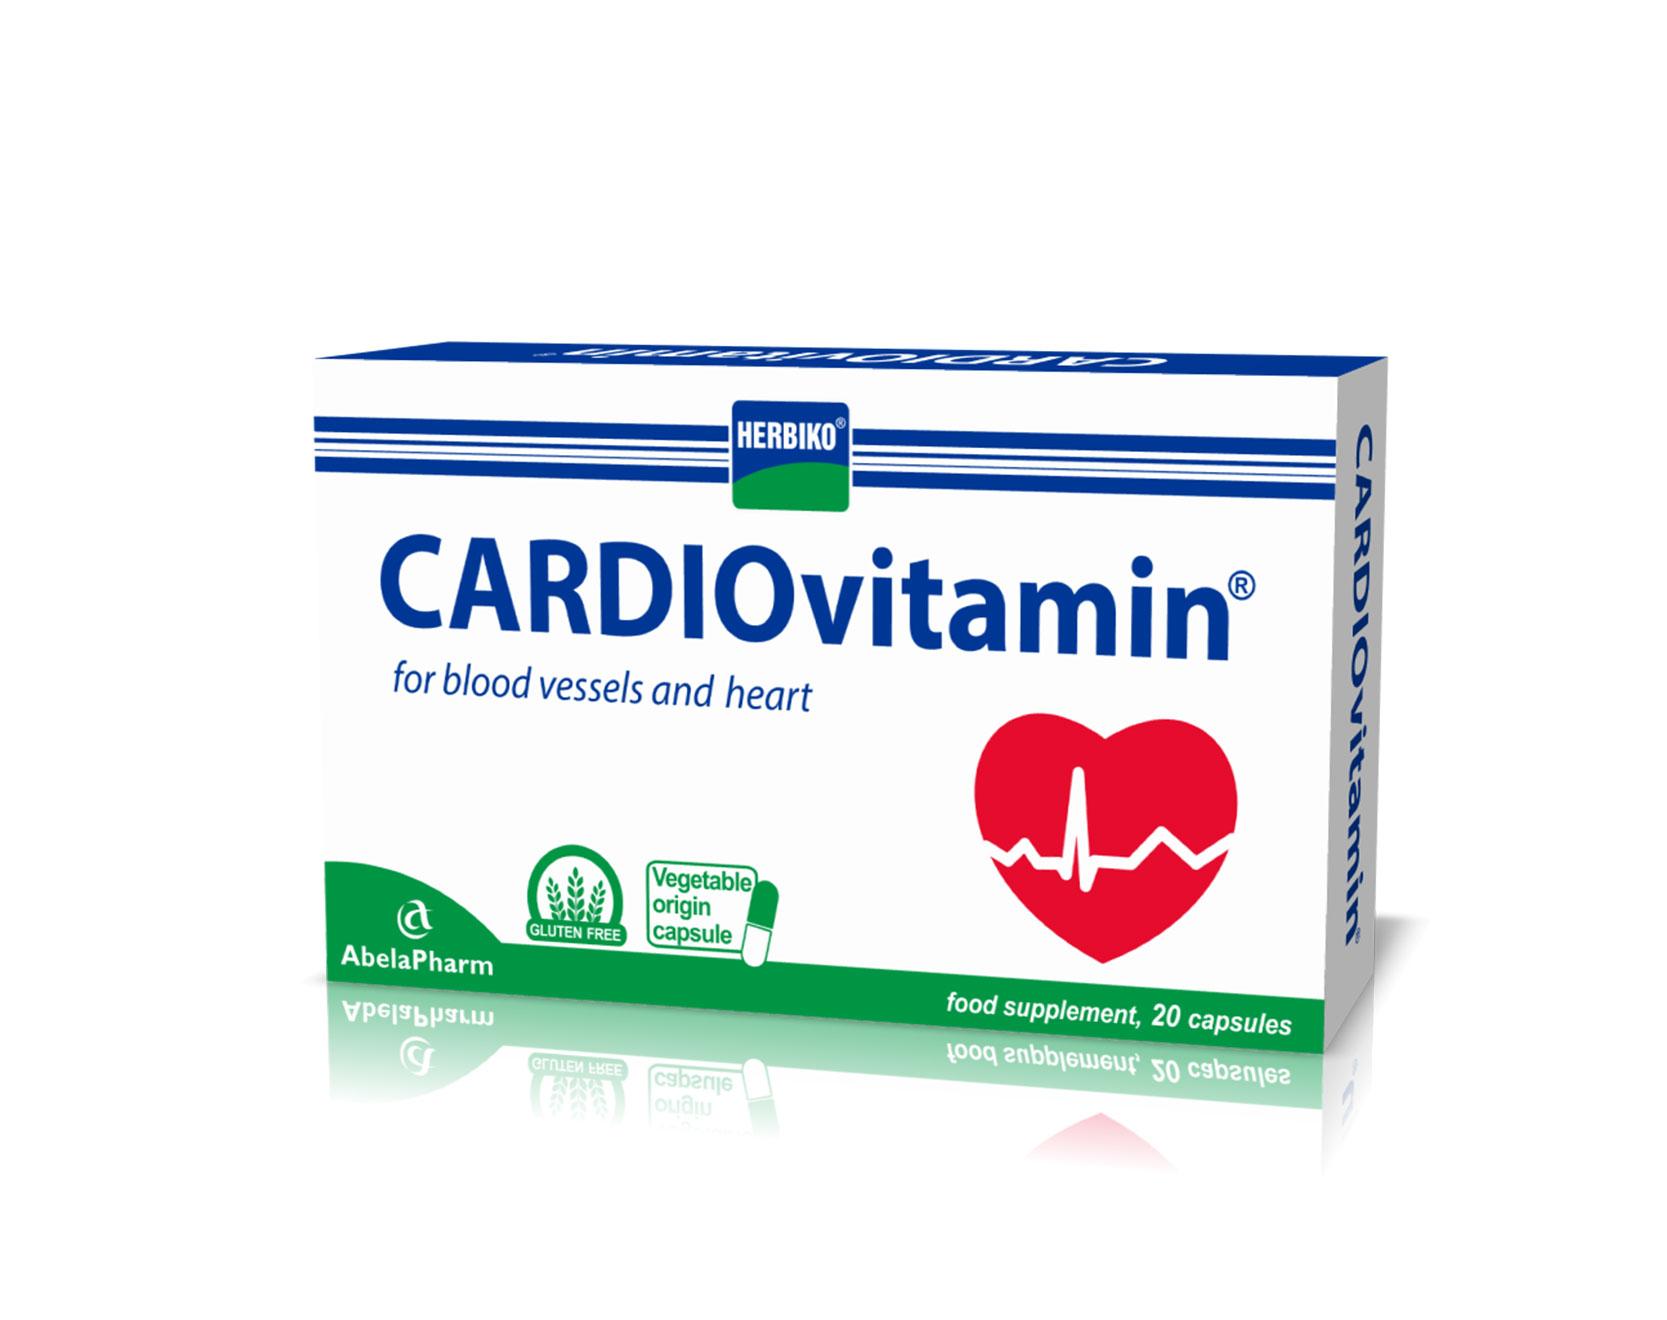 Cardiovitamin